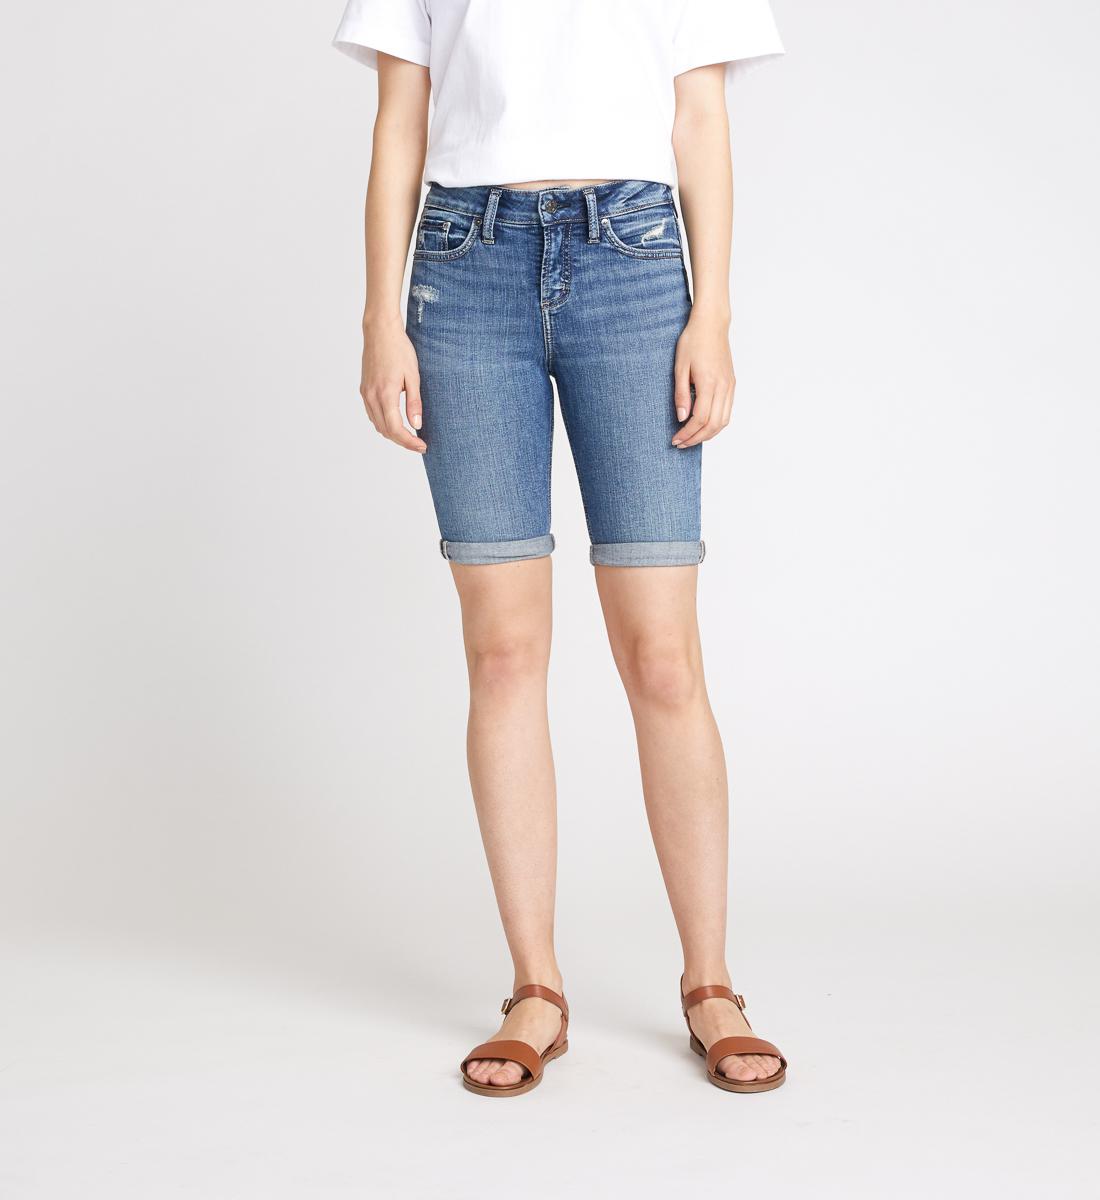 Silver Jeans Avery Bermuda